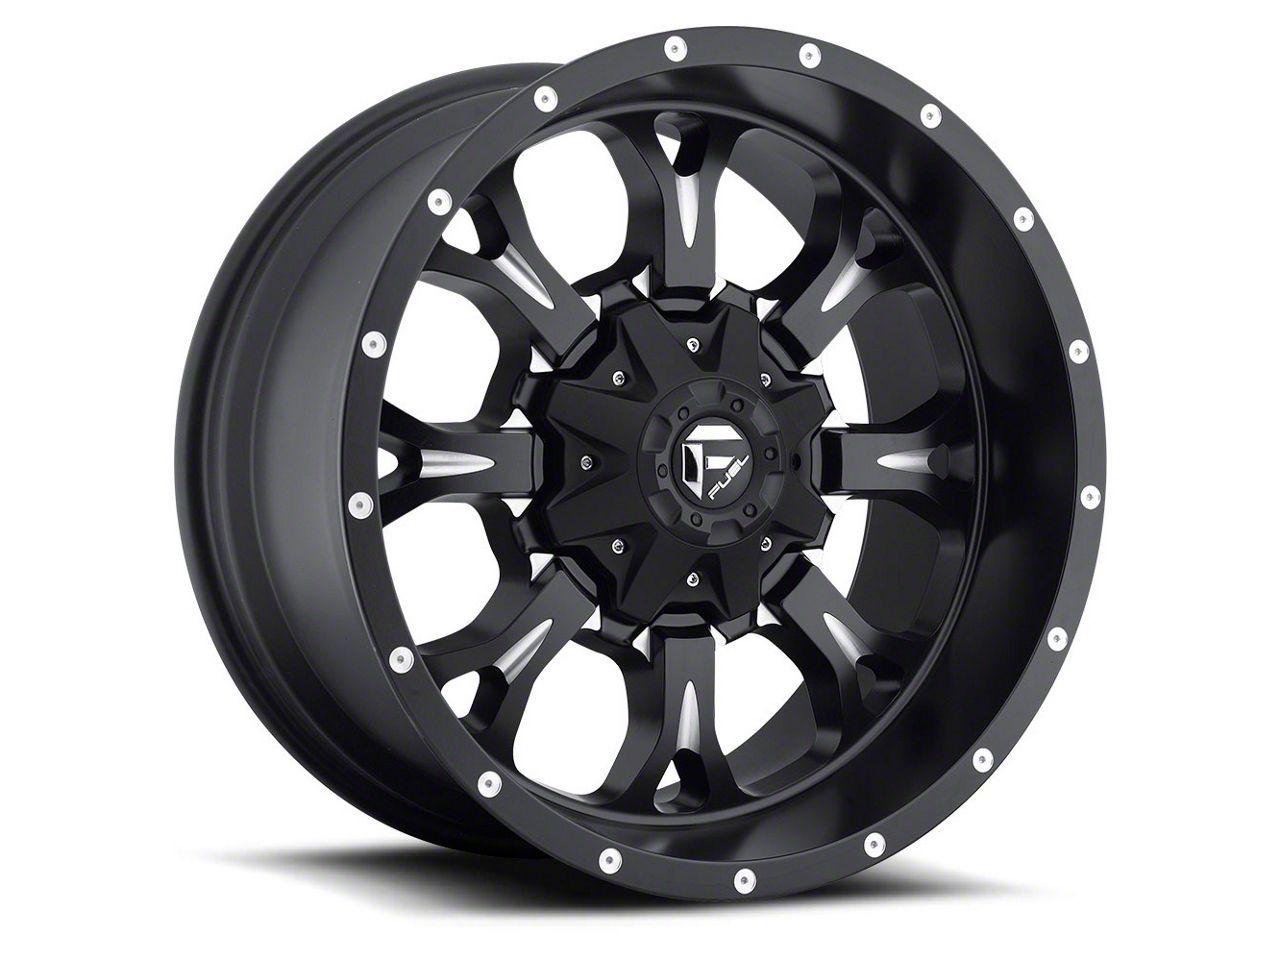 Fuel Wheels Krank Black Milled 6-Lug Wheel - 20x9 (07-18 Sierra 1500)